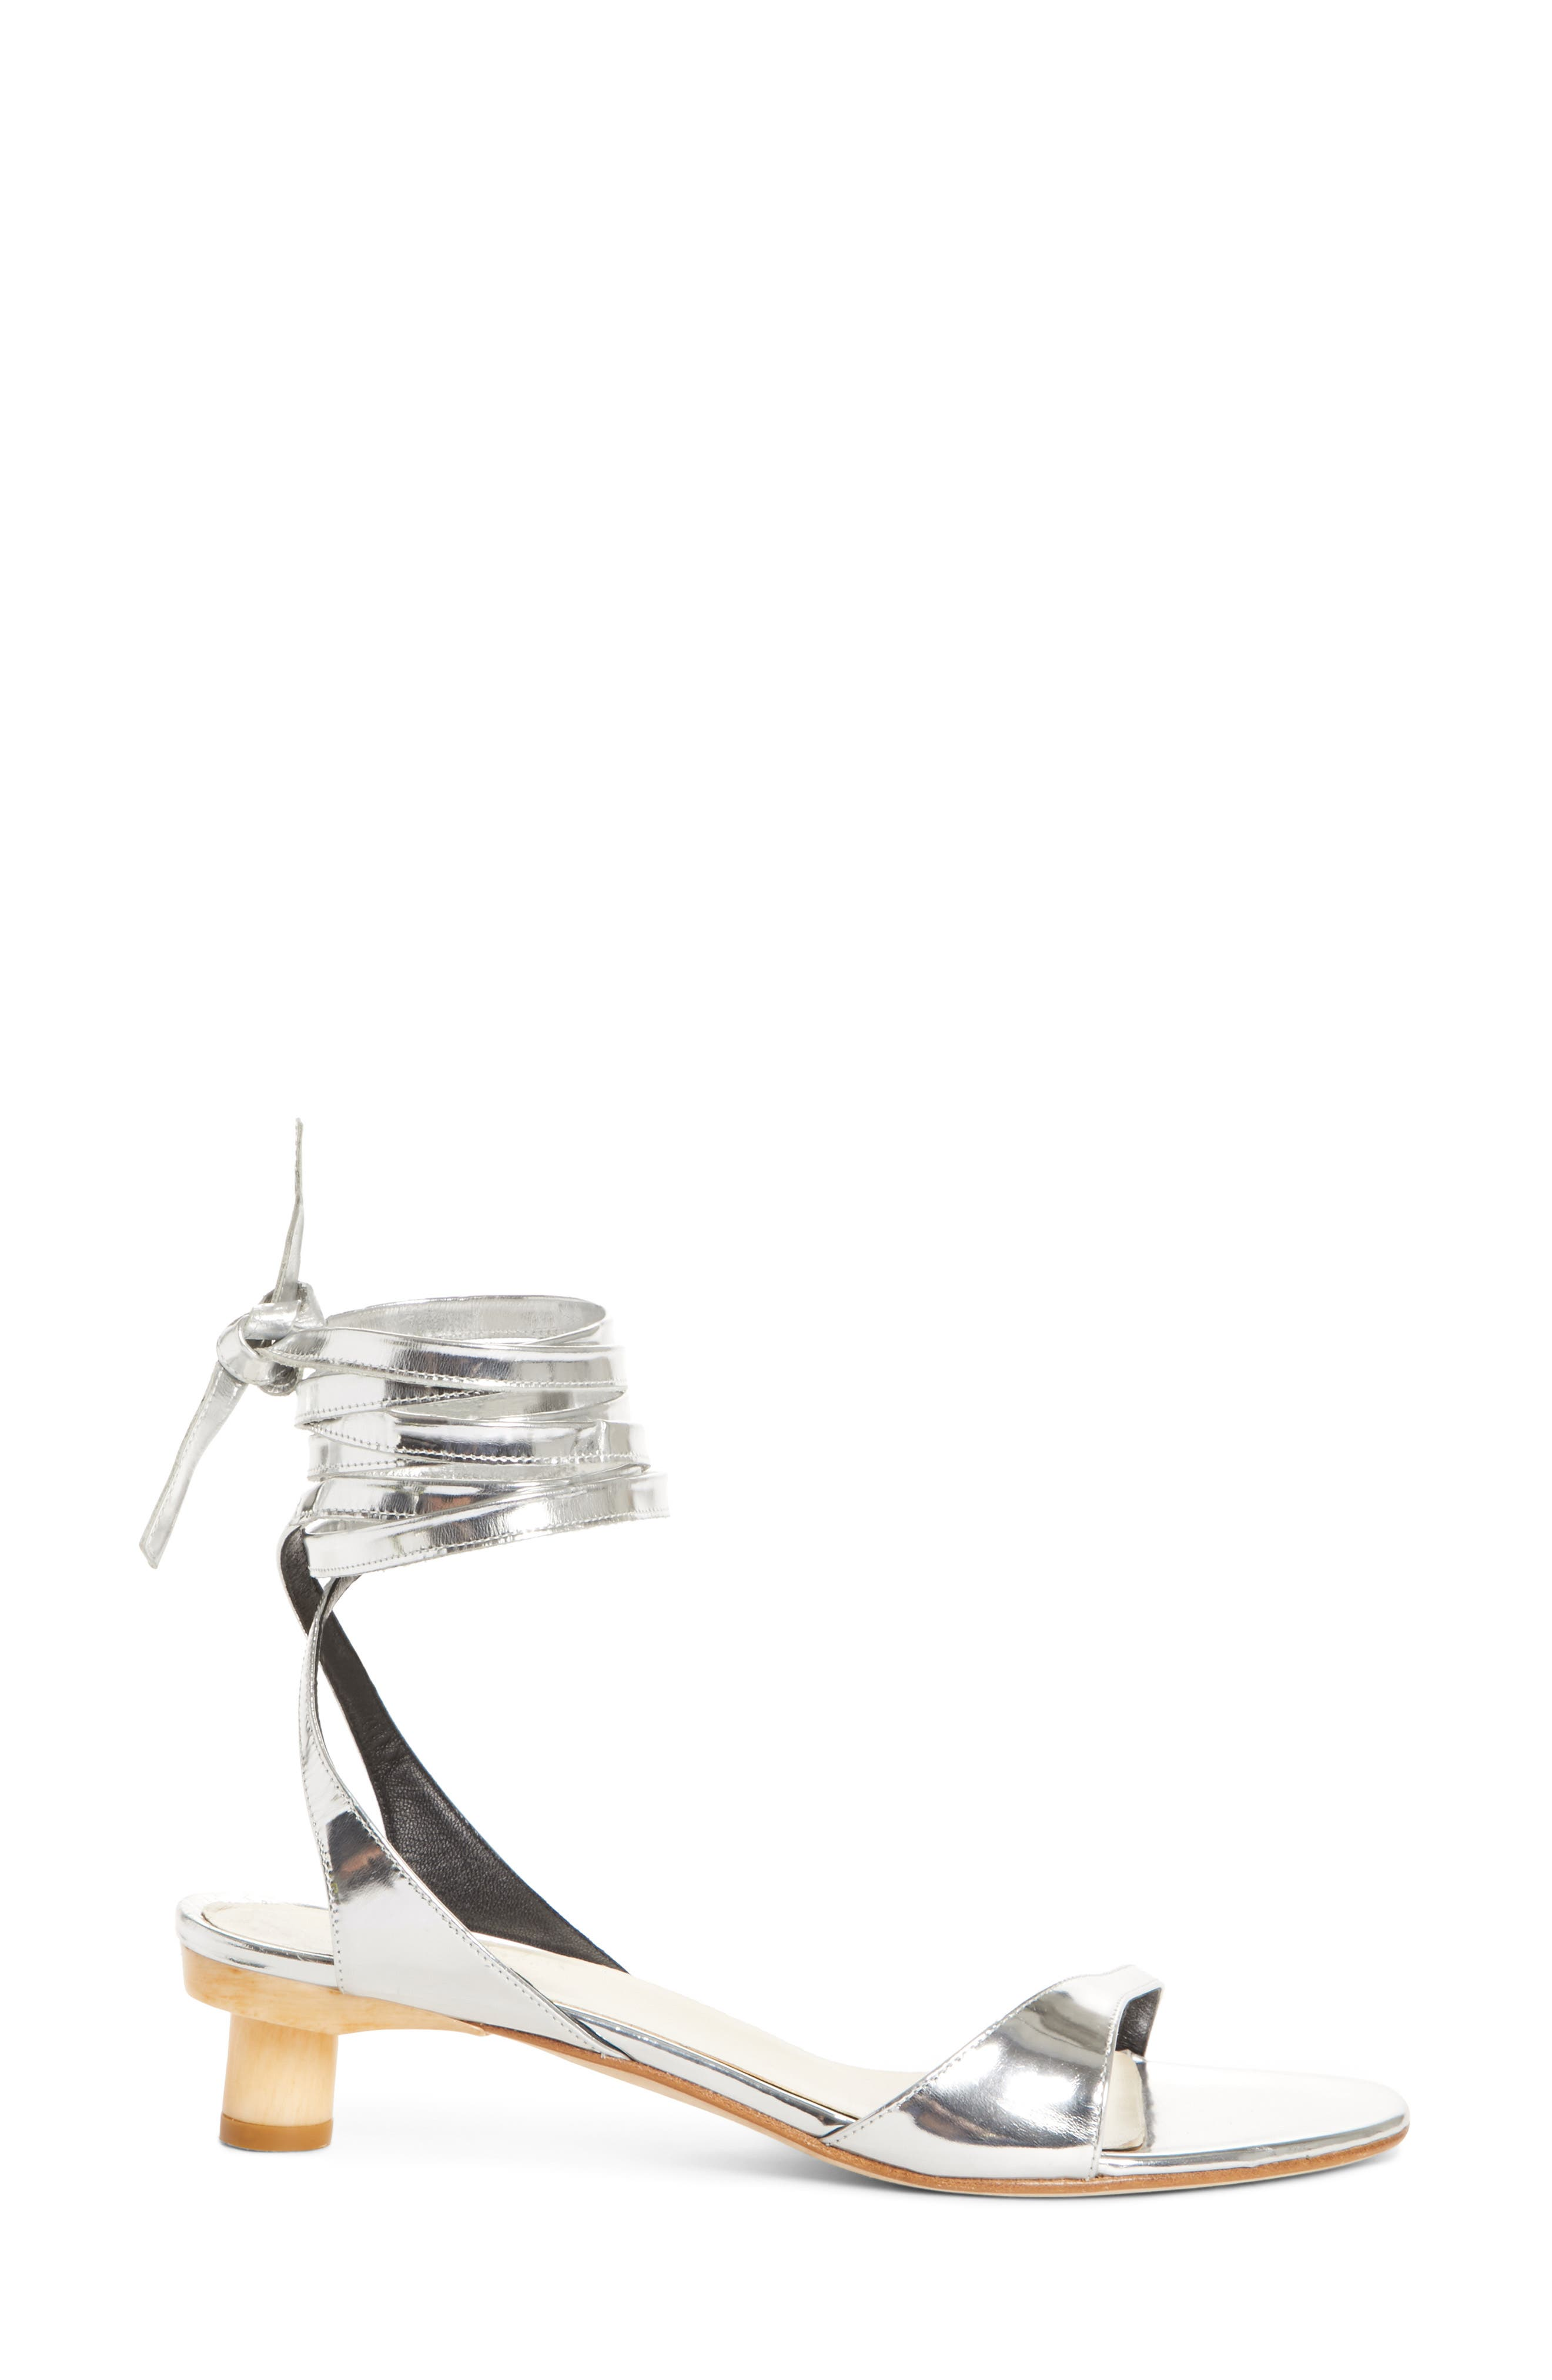 TIBI,                             Scott Ankle Tie Sandal,                             Alternate thumbnail 3, color,                             042